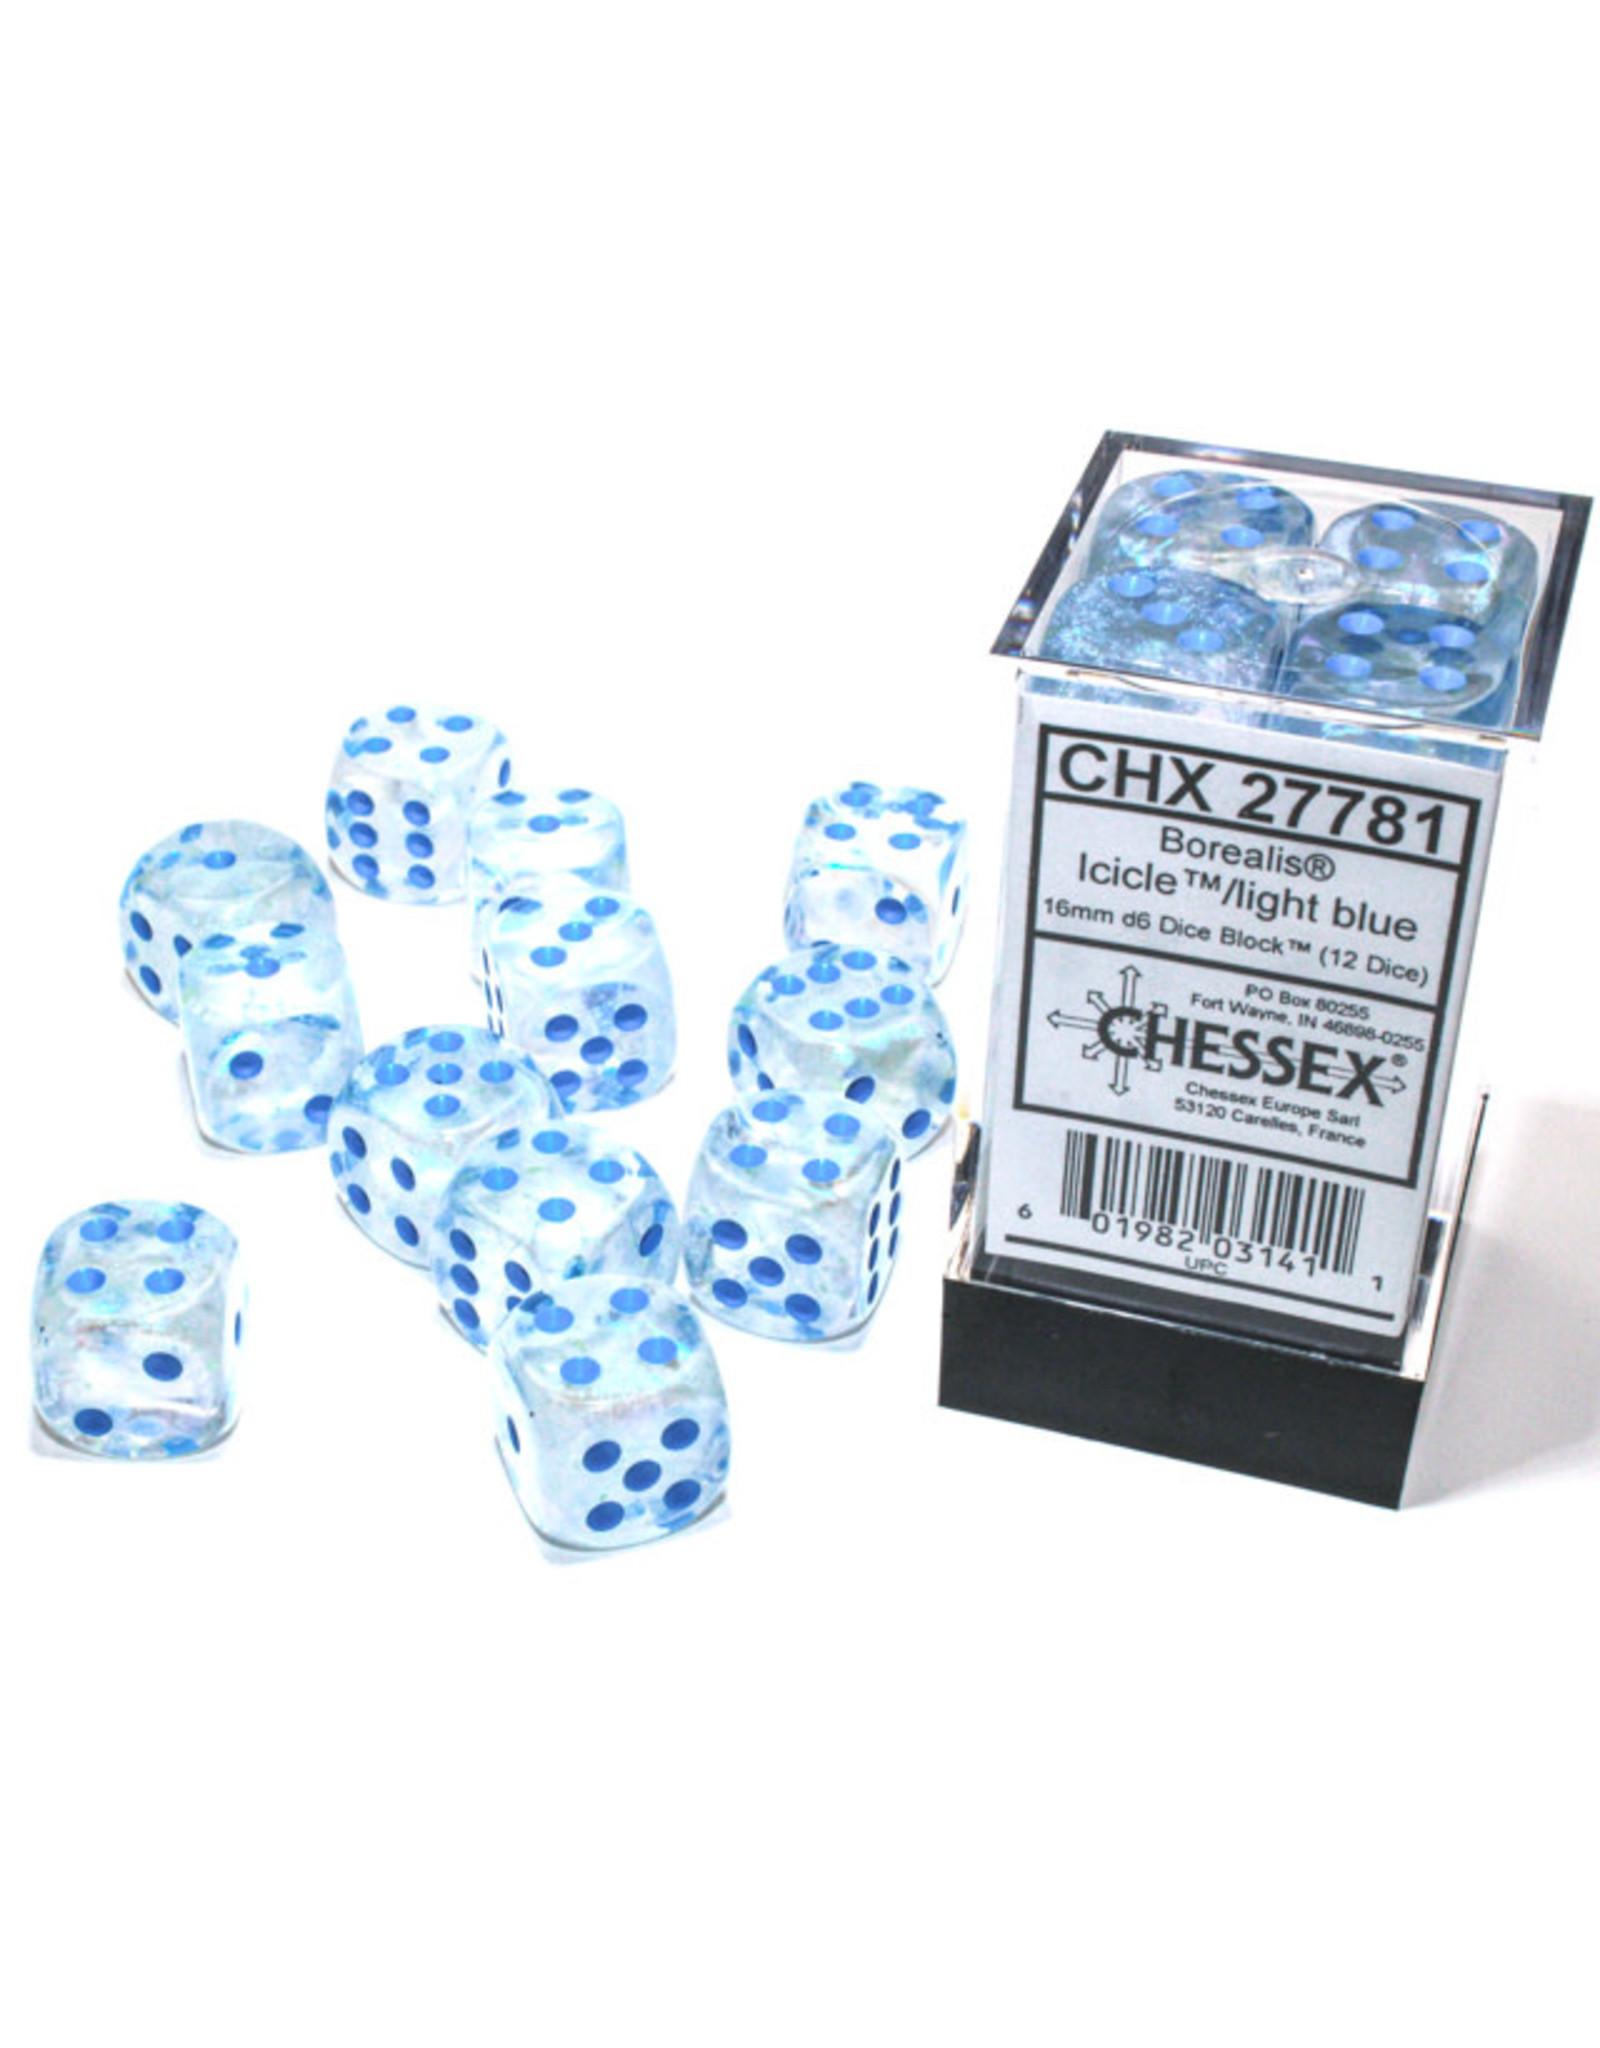 Chessex Borealis: 16mm d6 Icicle/light blue Luminary Dice Block (12 dice) CHX 27781